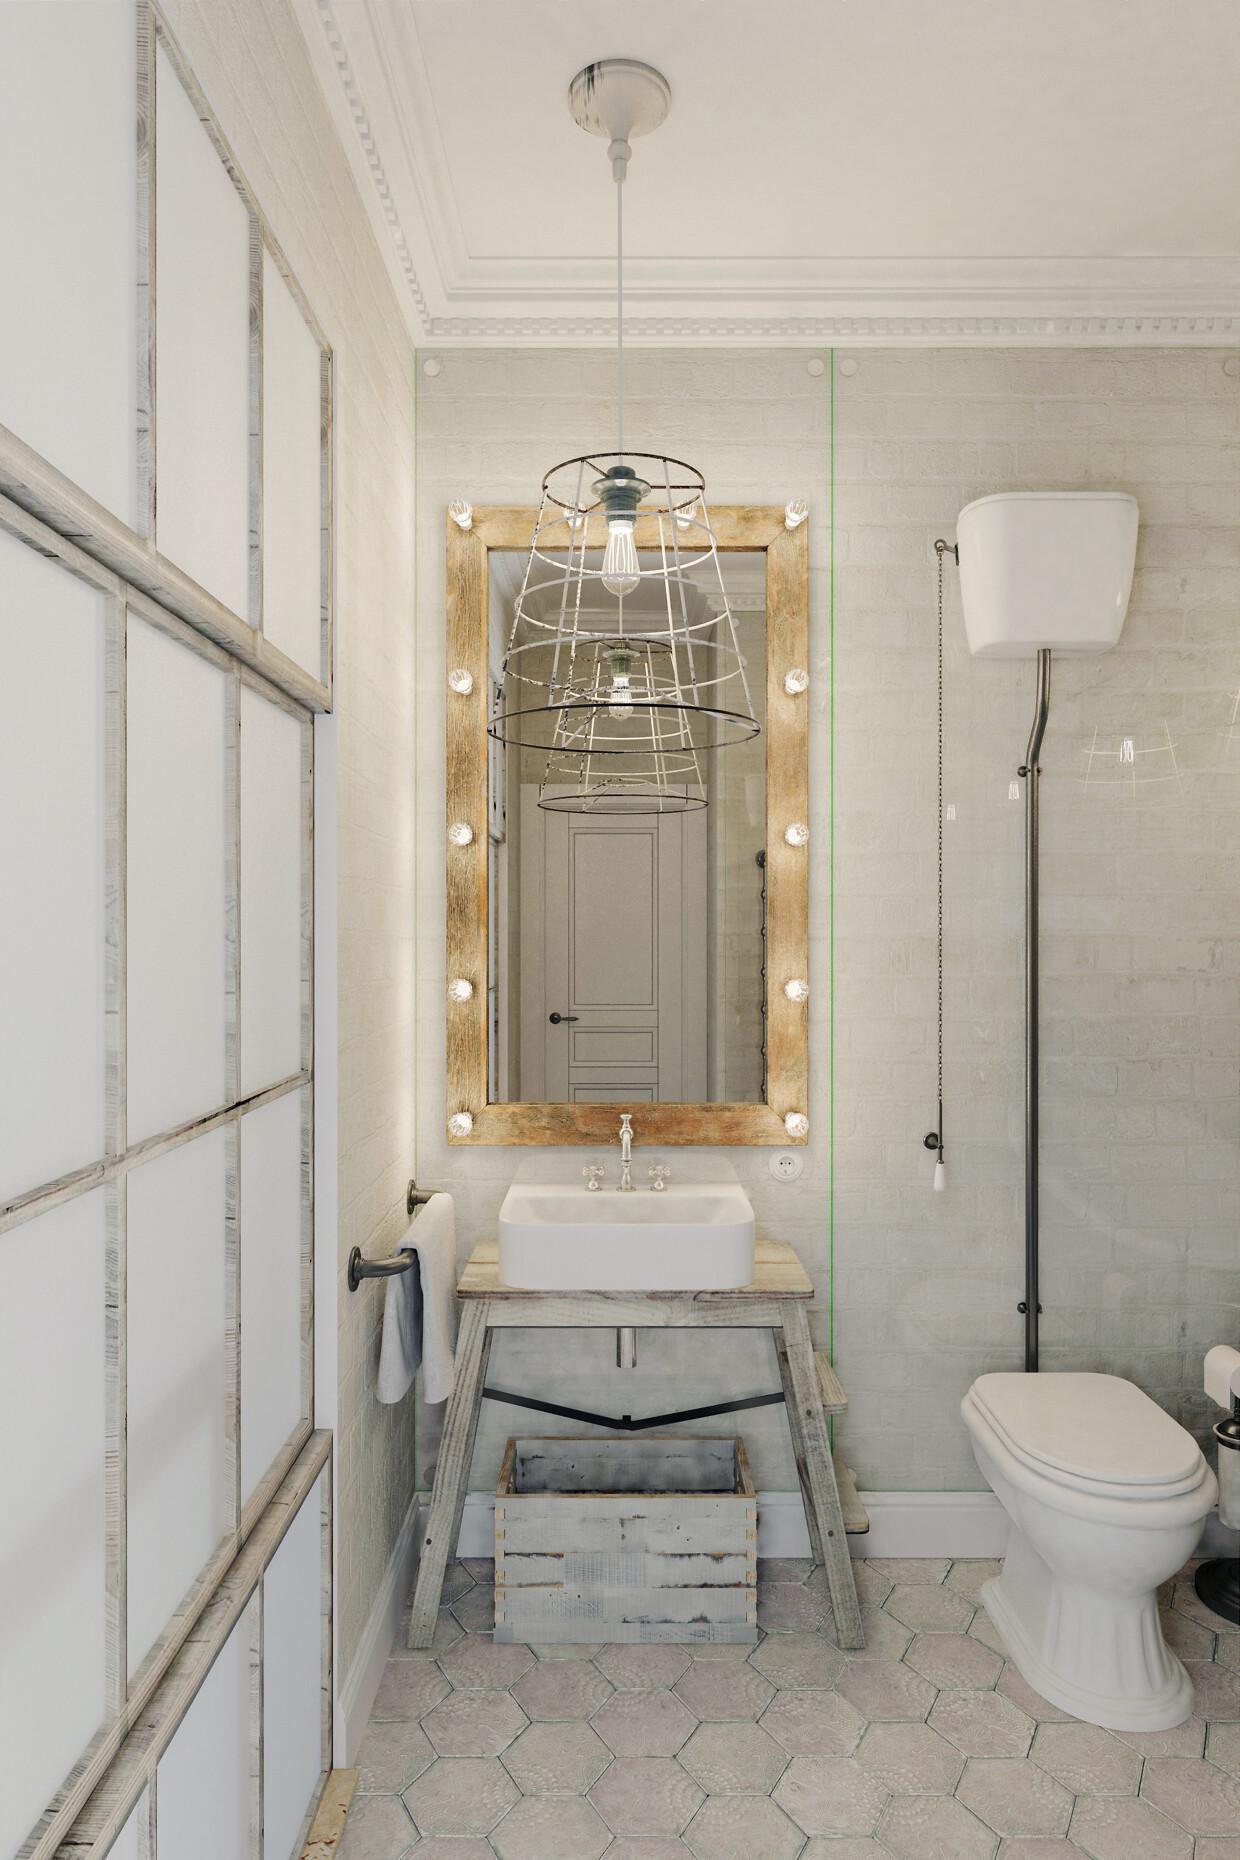 Apartment in prague with a completely white interior for Designer apartment prague